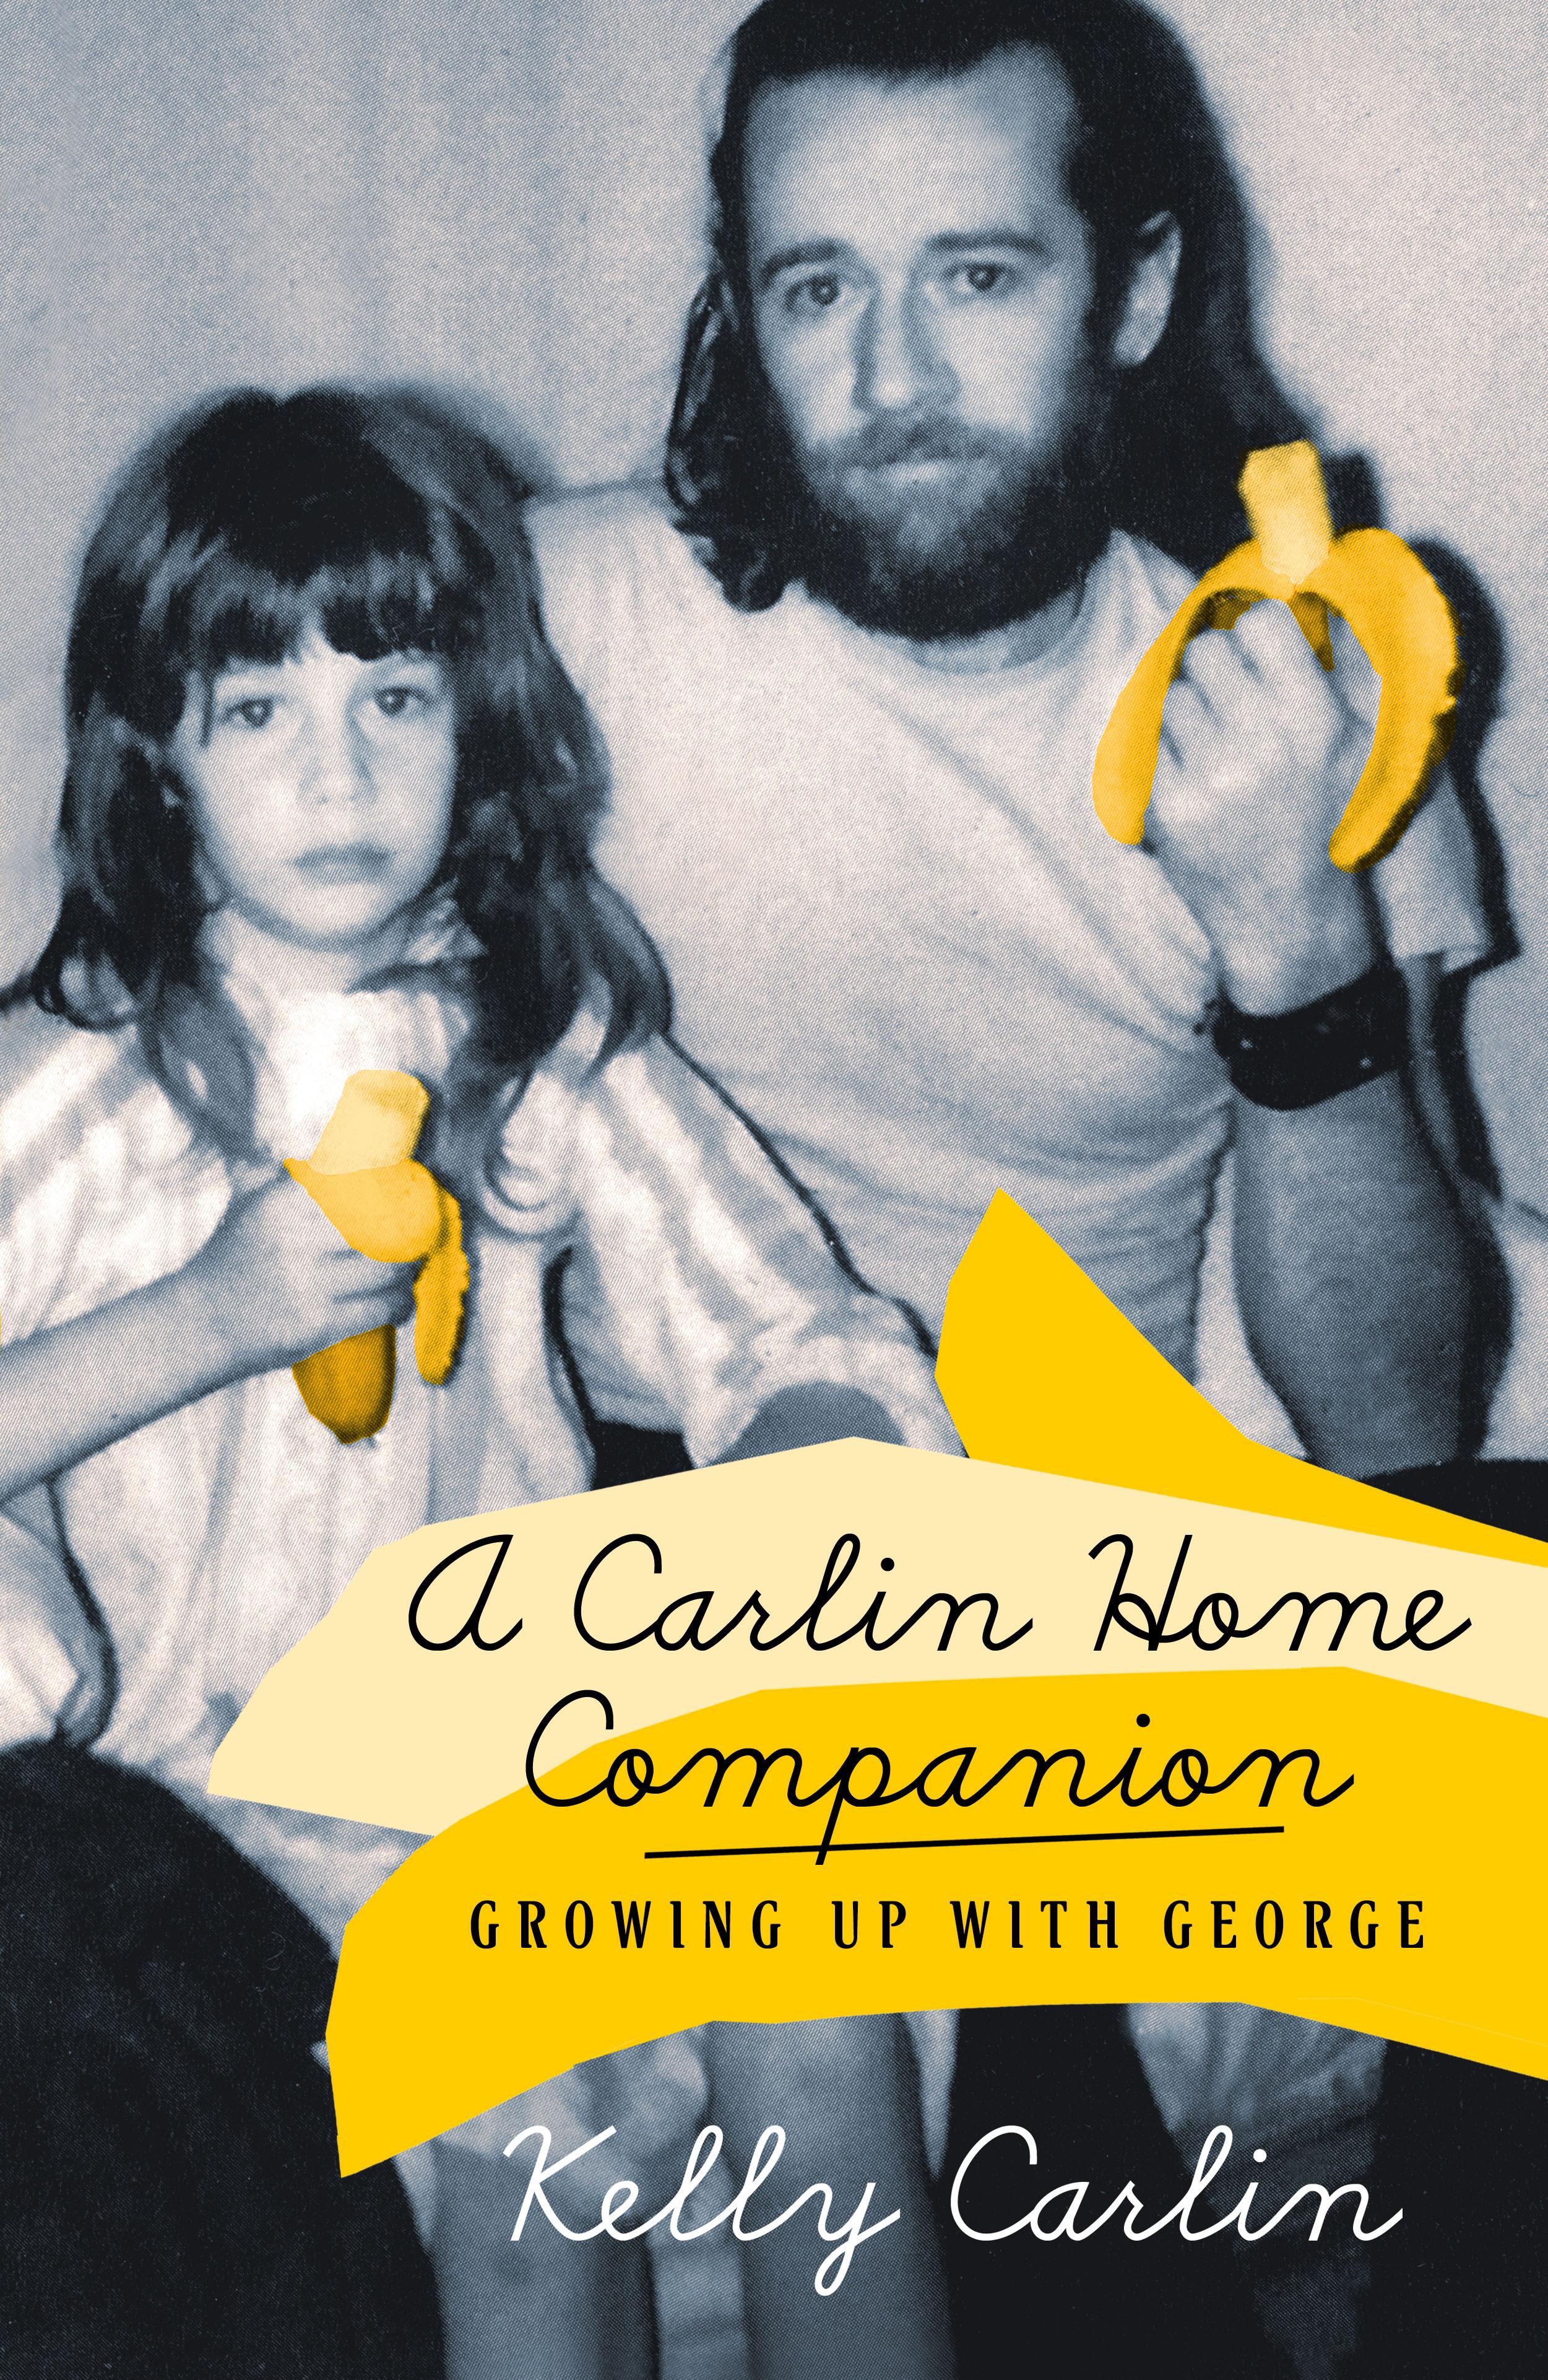 Carlin book